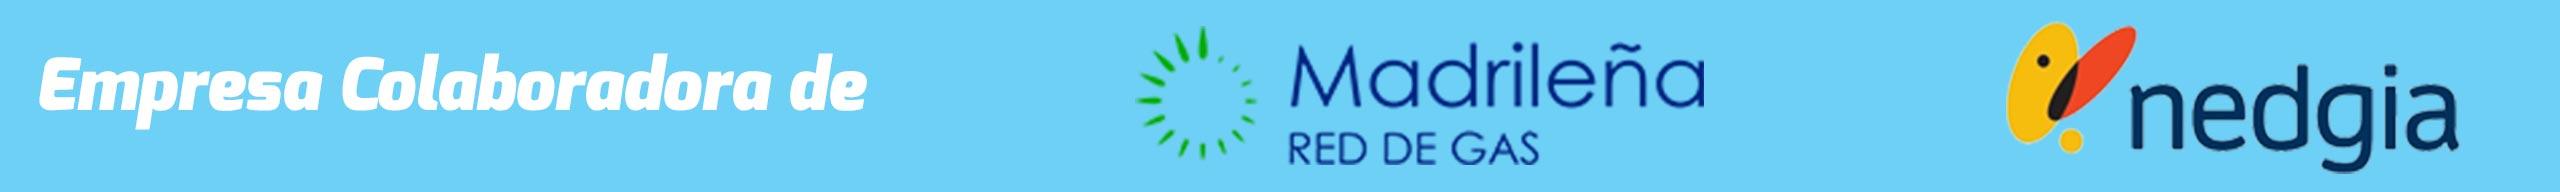 Empresa colaboradora de Nedgia y Madrileña Red de Gas